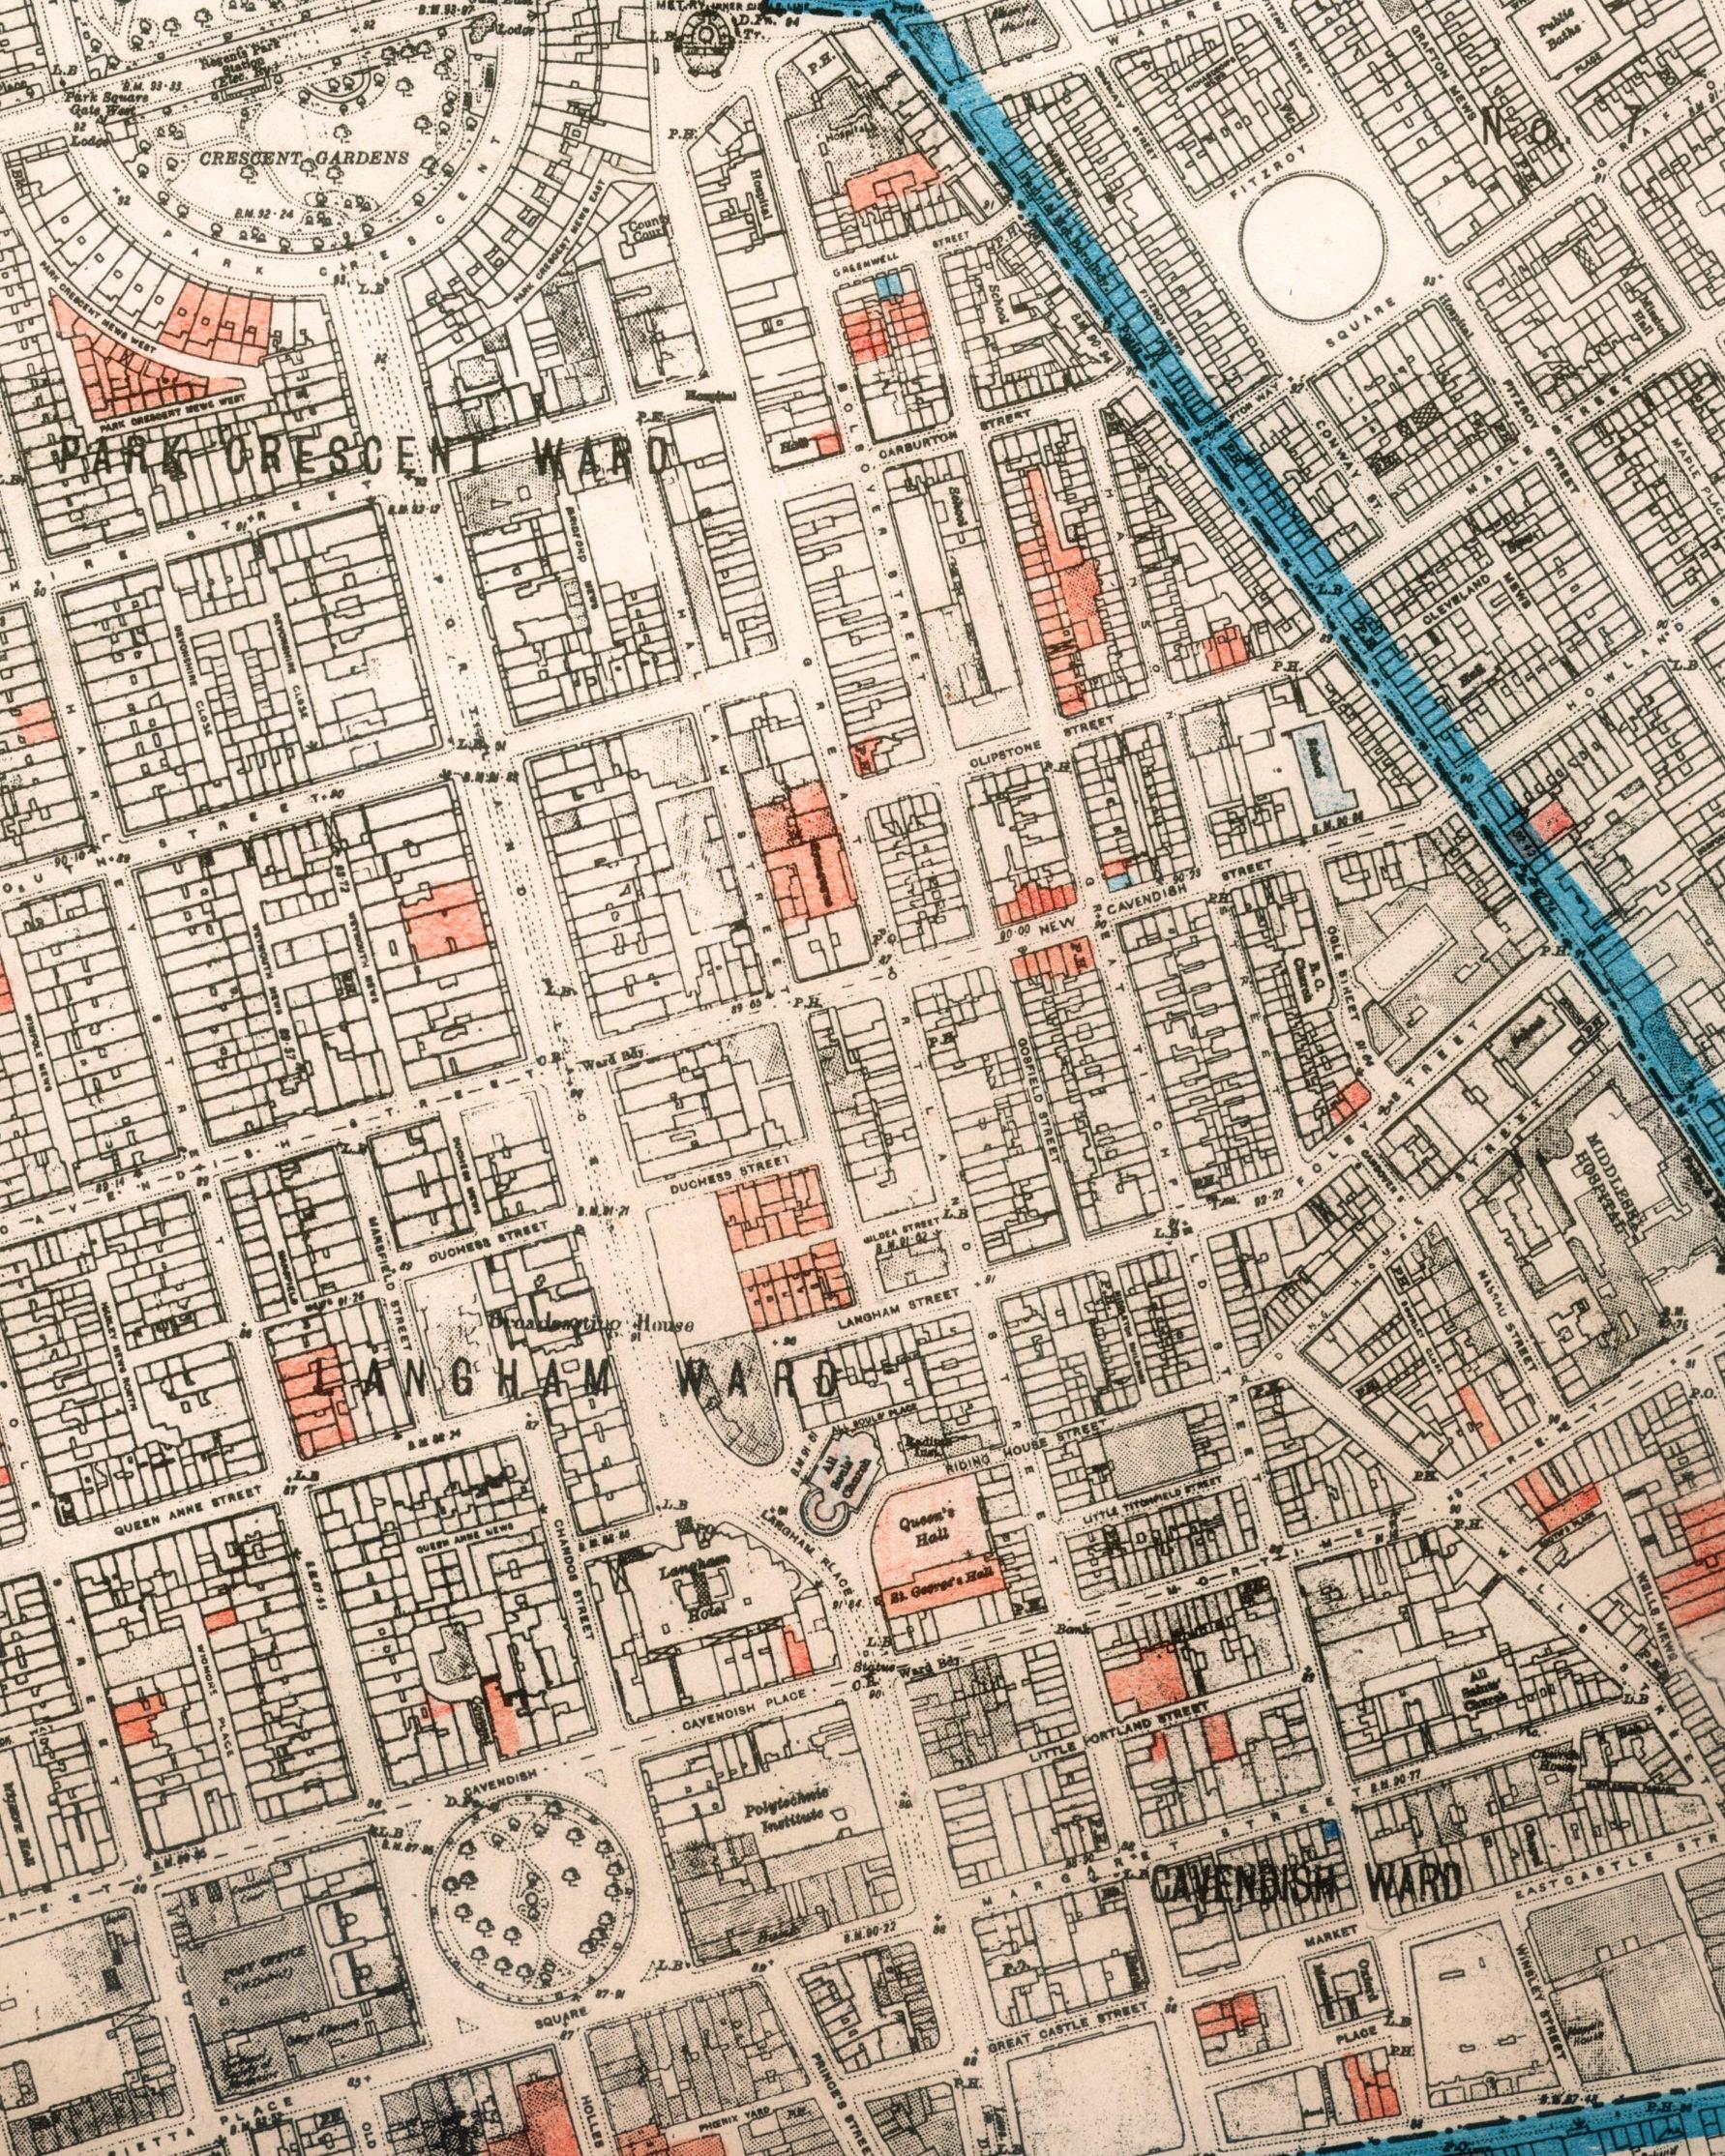 FileAir Raid Damage Map East Marylebonejpg Wikimedia Commons - London map 1945